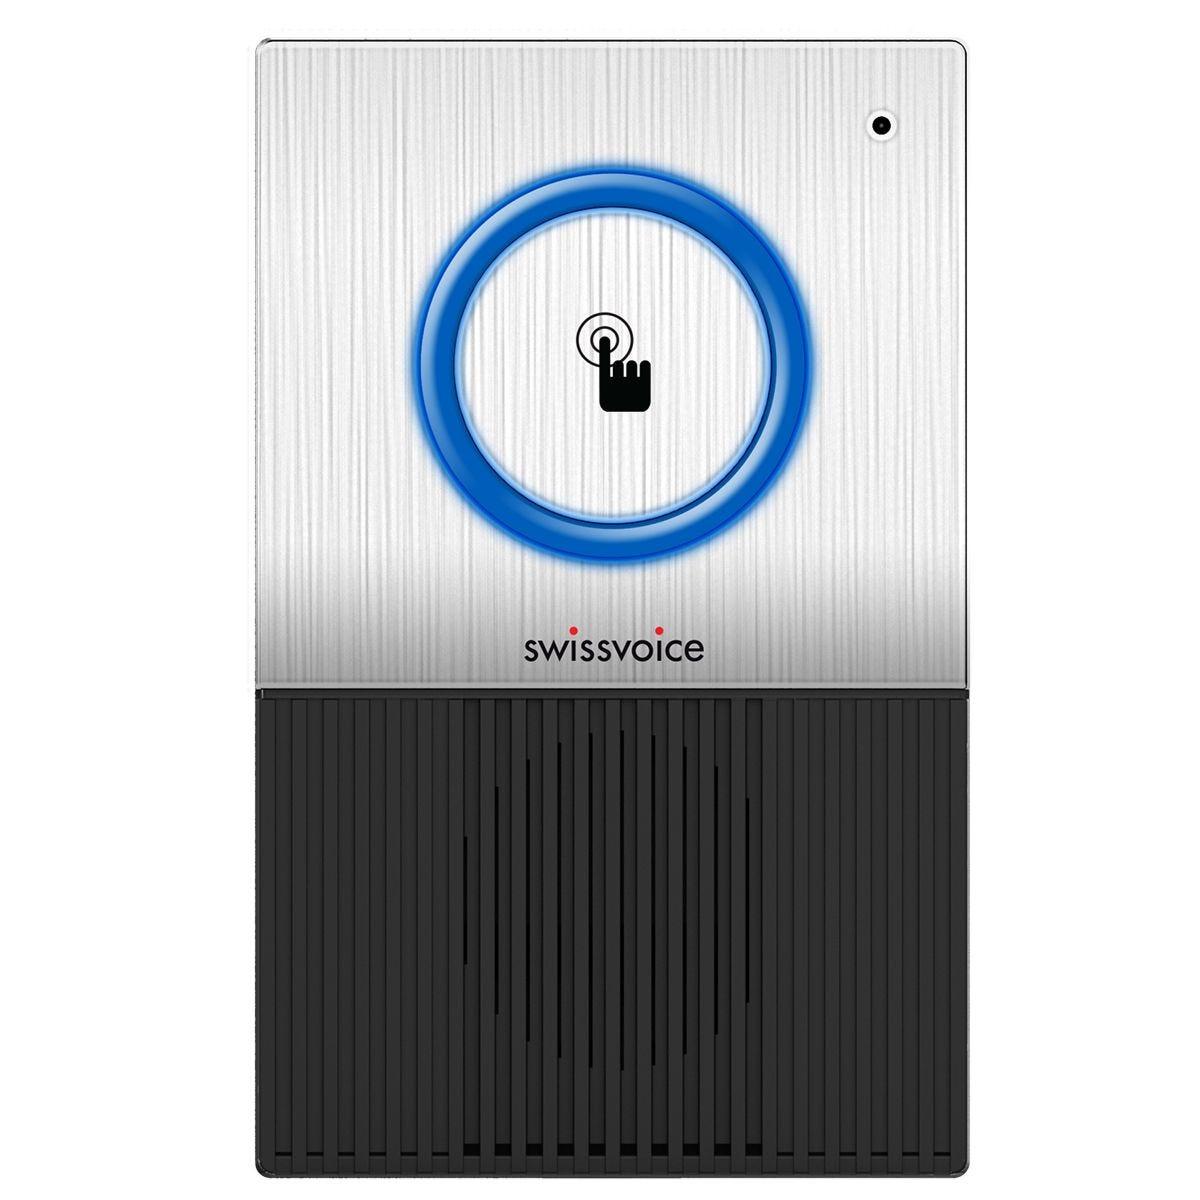 Swissvoice Xtra Doorbell 8155